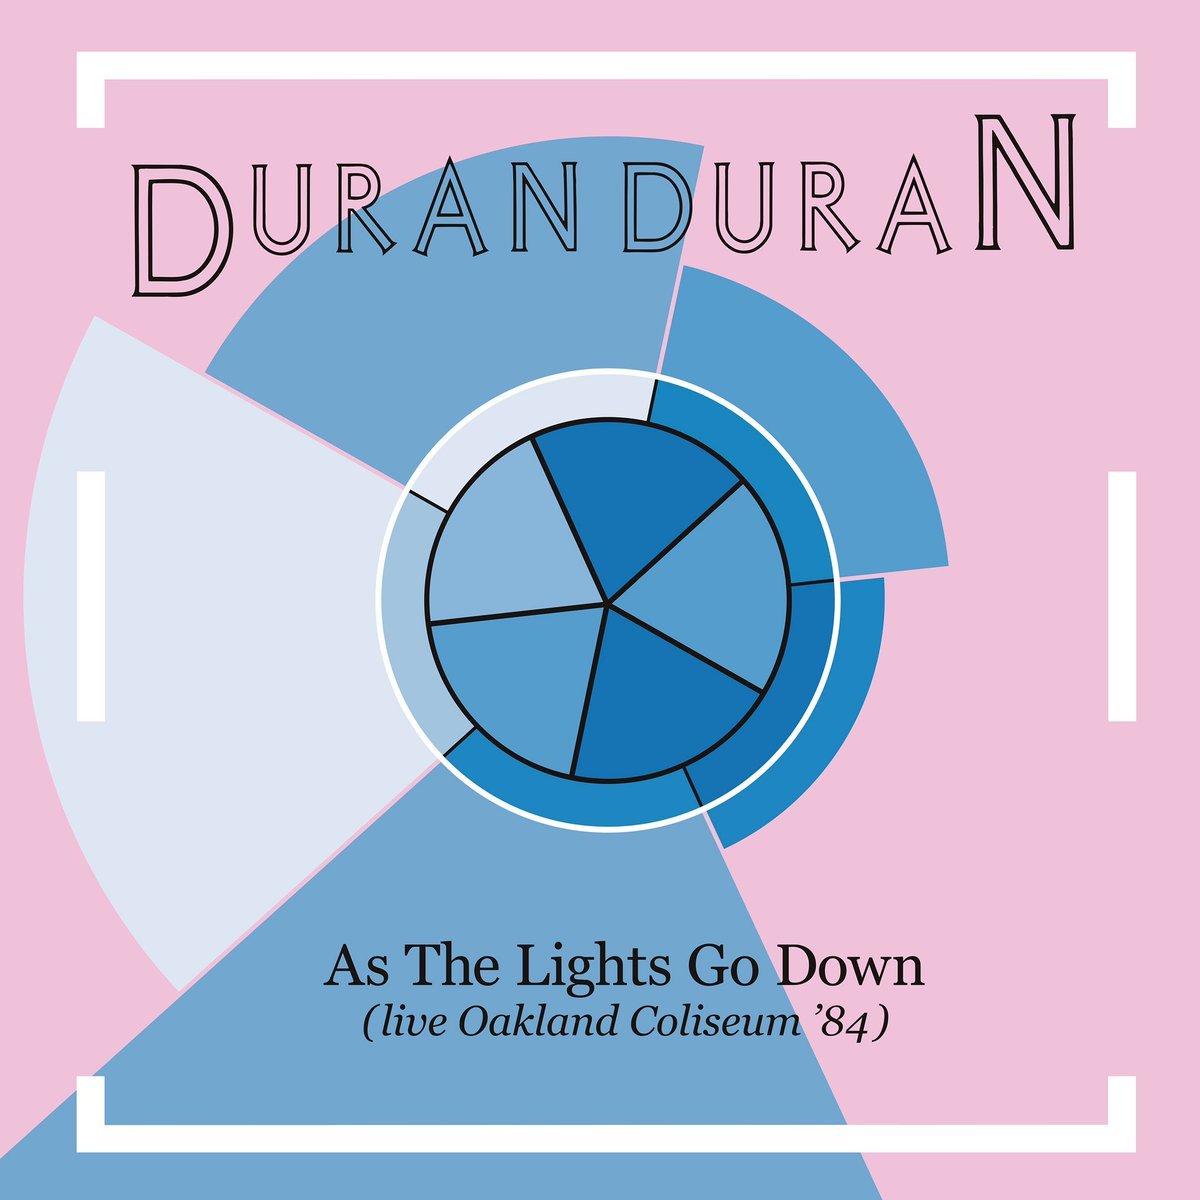 DURAN DURAN | 'As The Lights Go Down' (Live Oakland Coliseum '84)